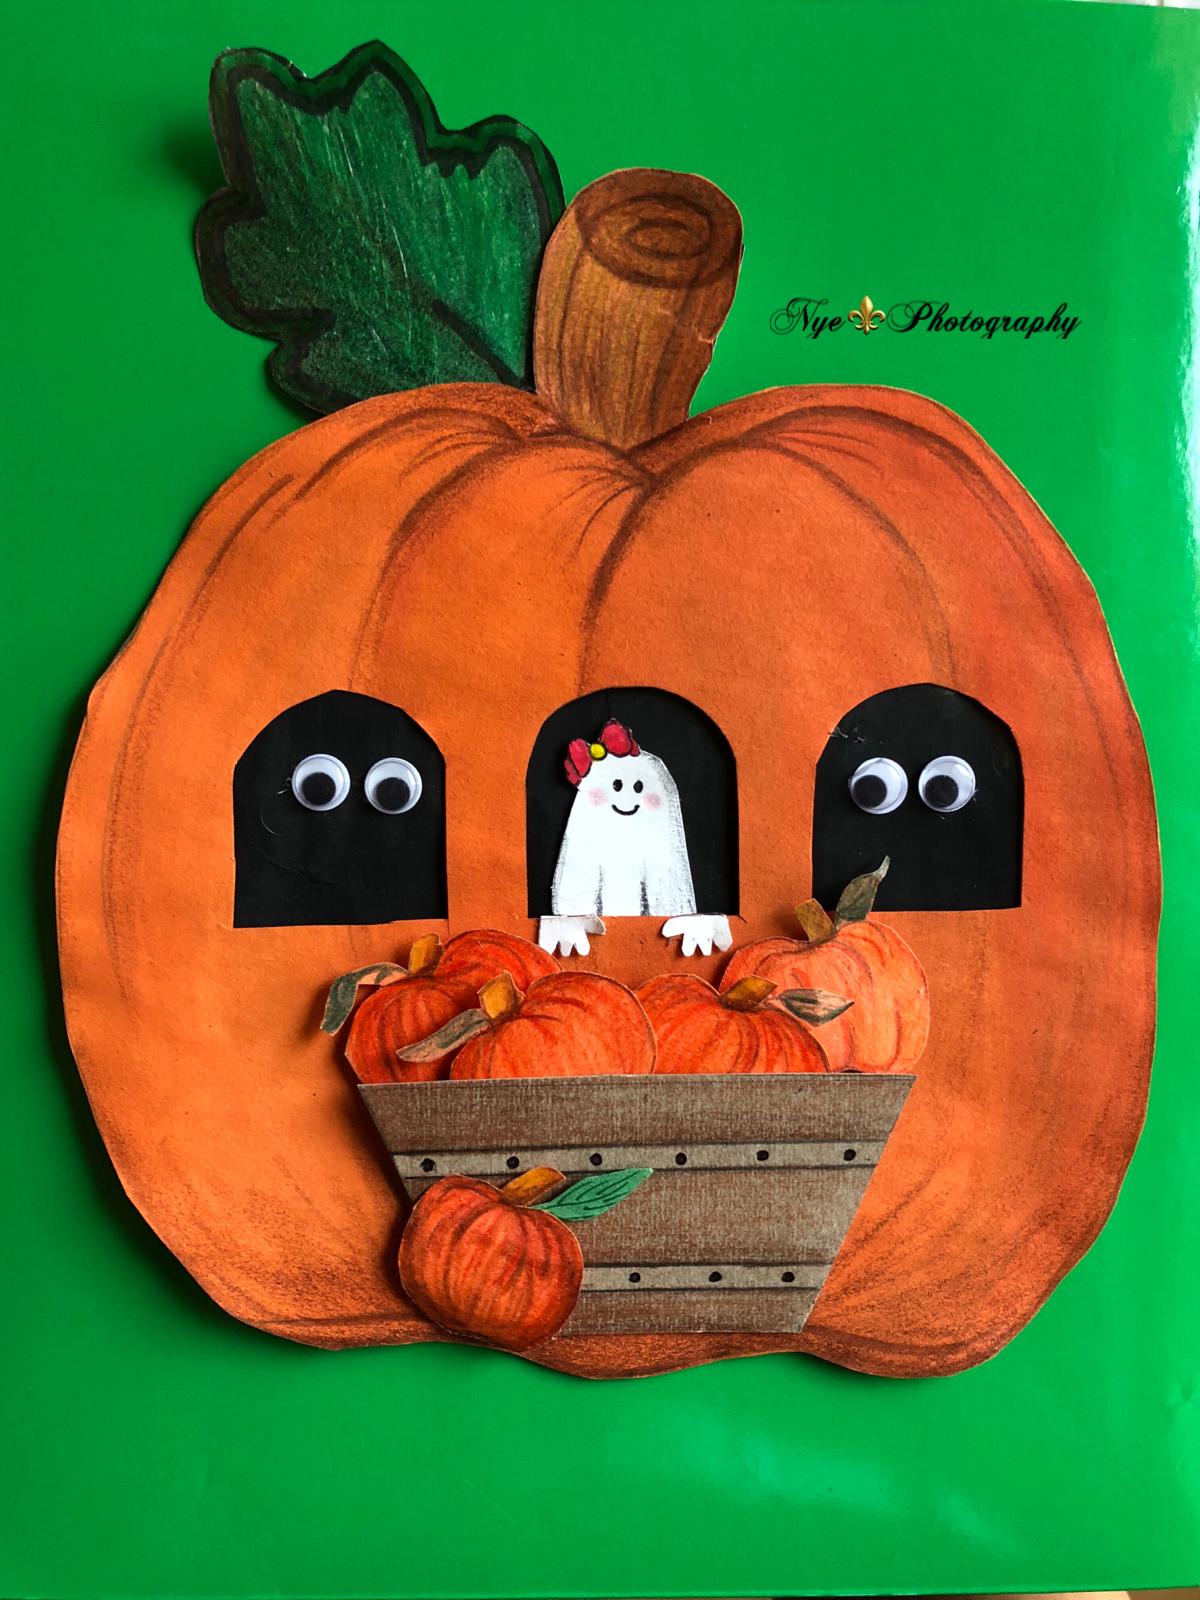 DIY pumpkin decoration. Paper pumpkin decoration. Pumpkin